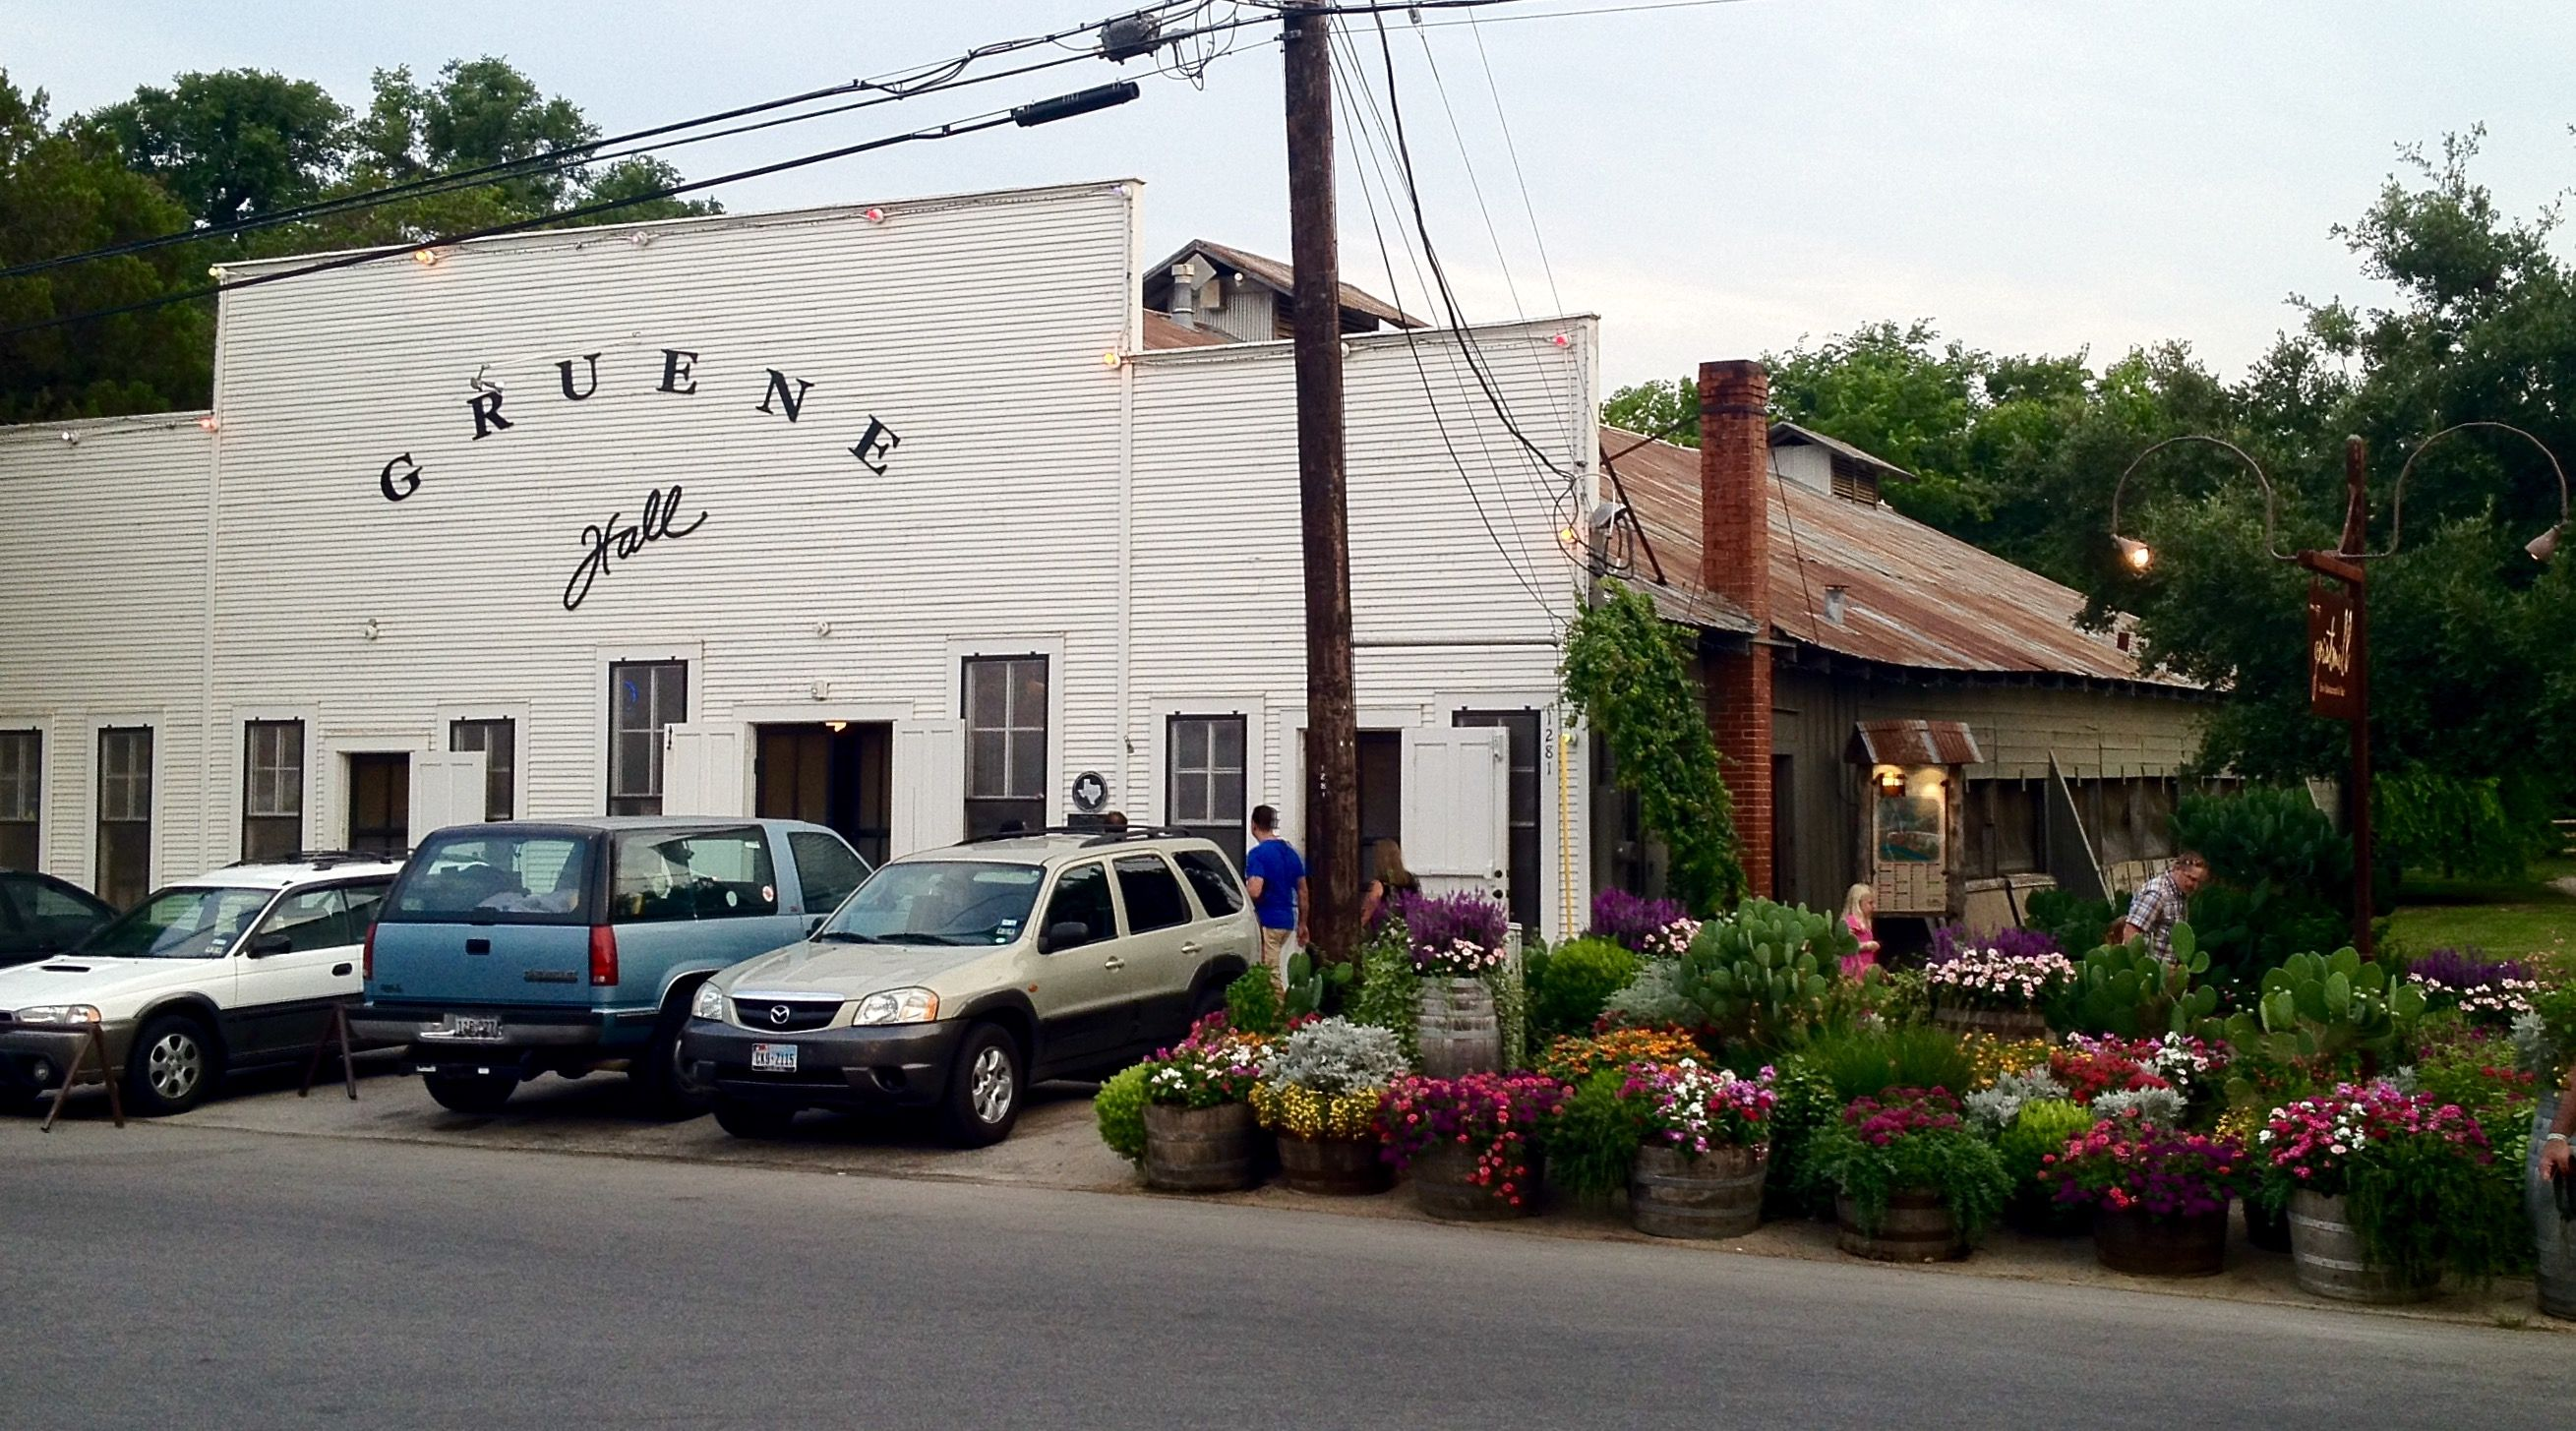 Gruene Dance Hall - the oldest dance hall in Texas